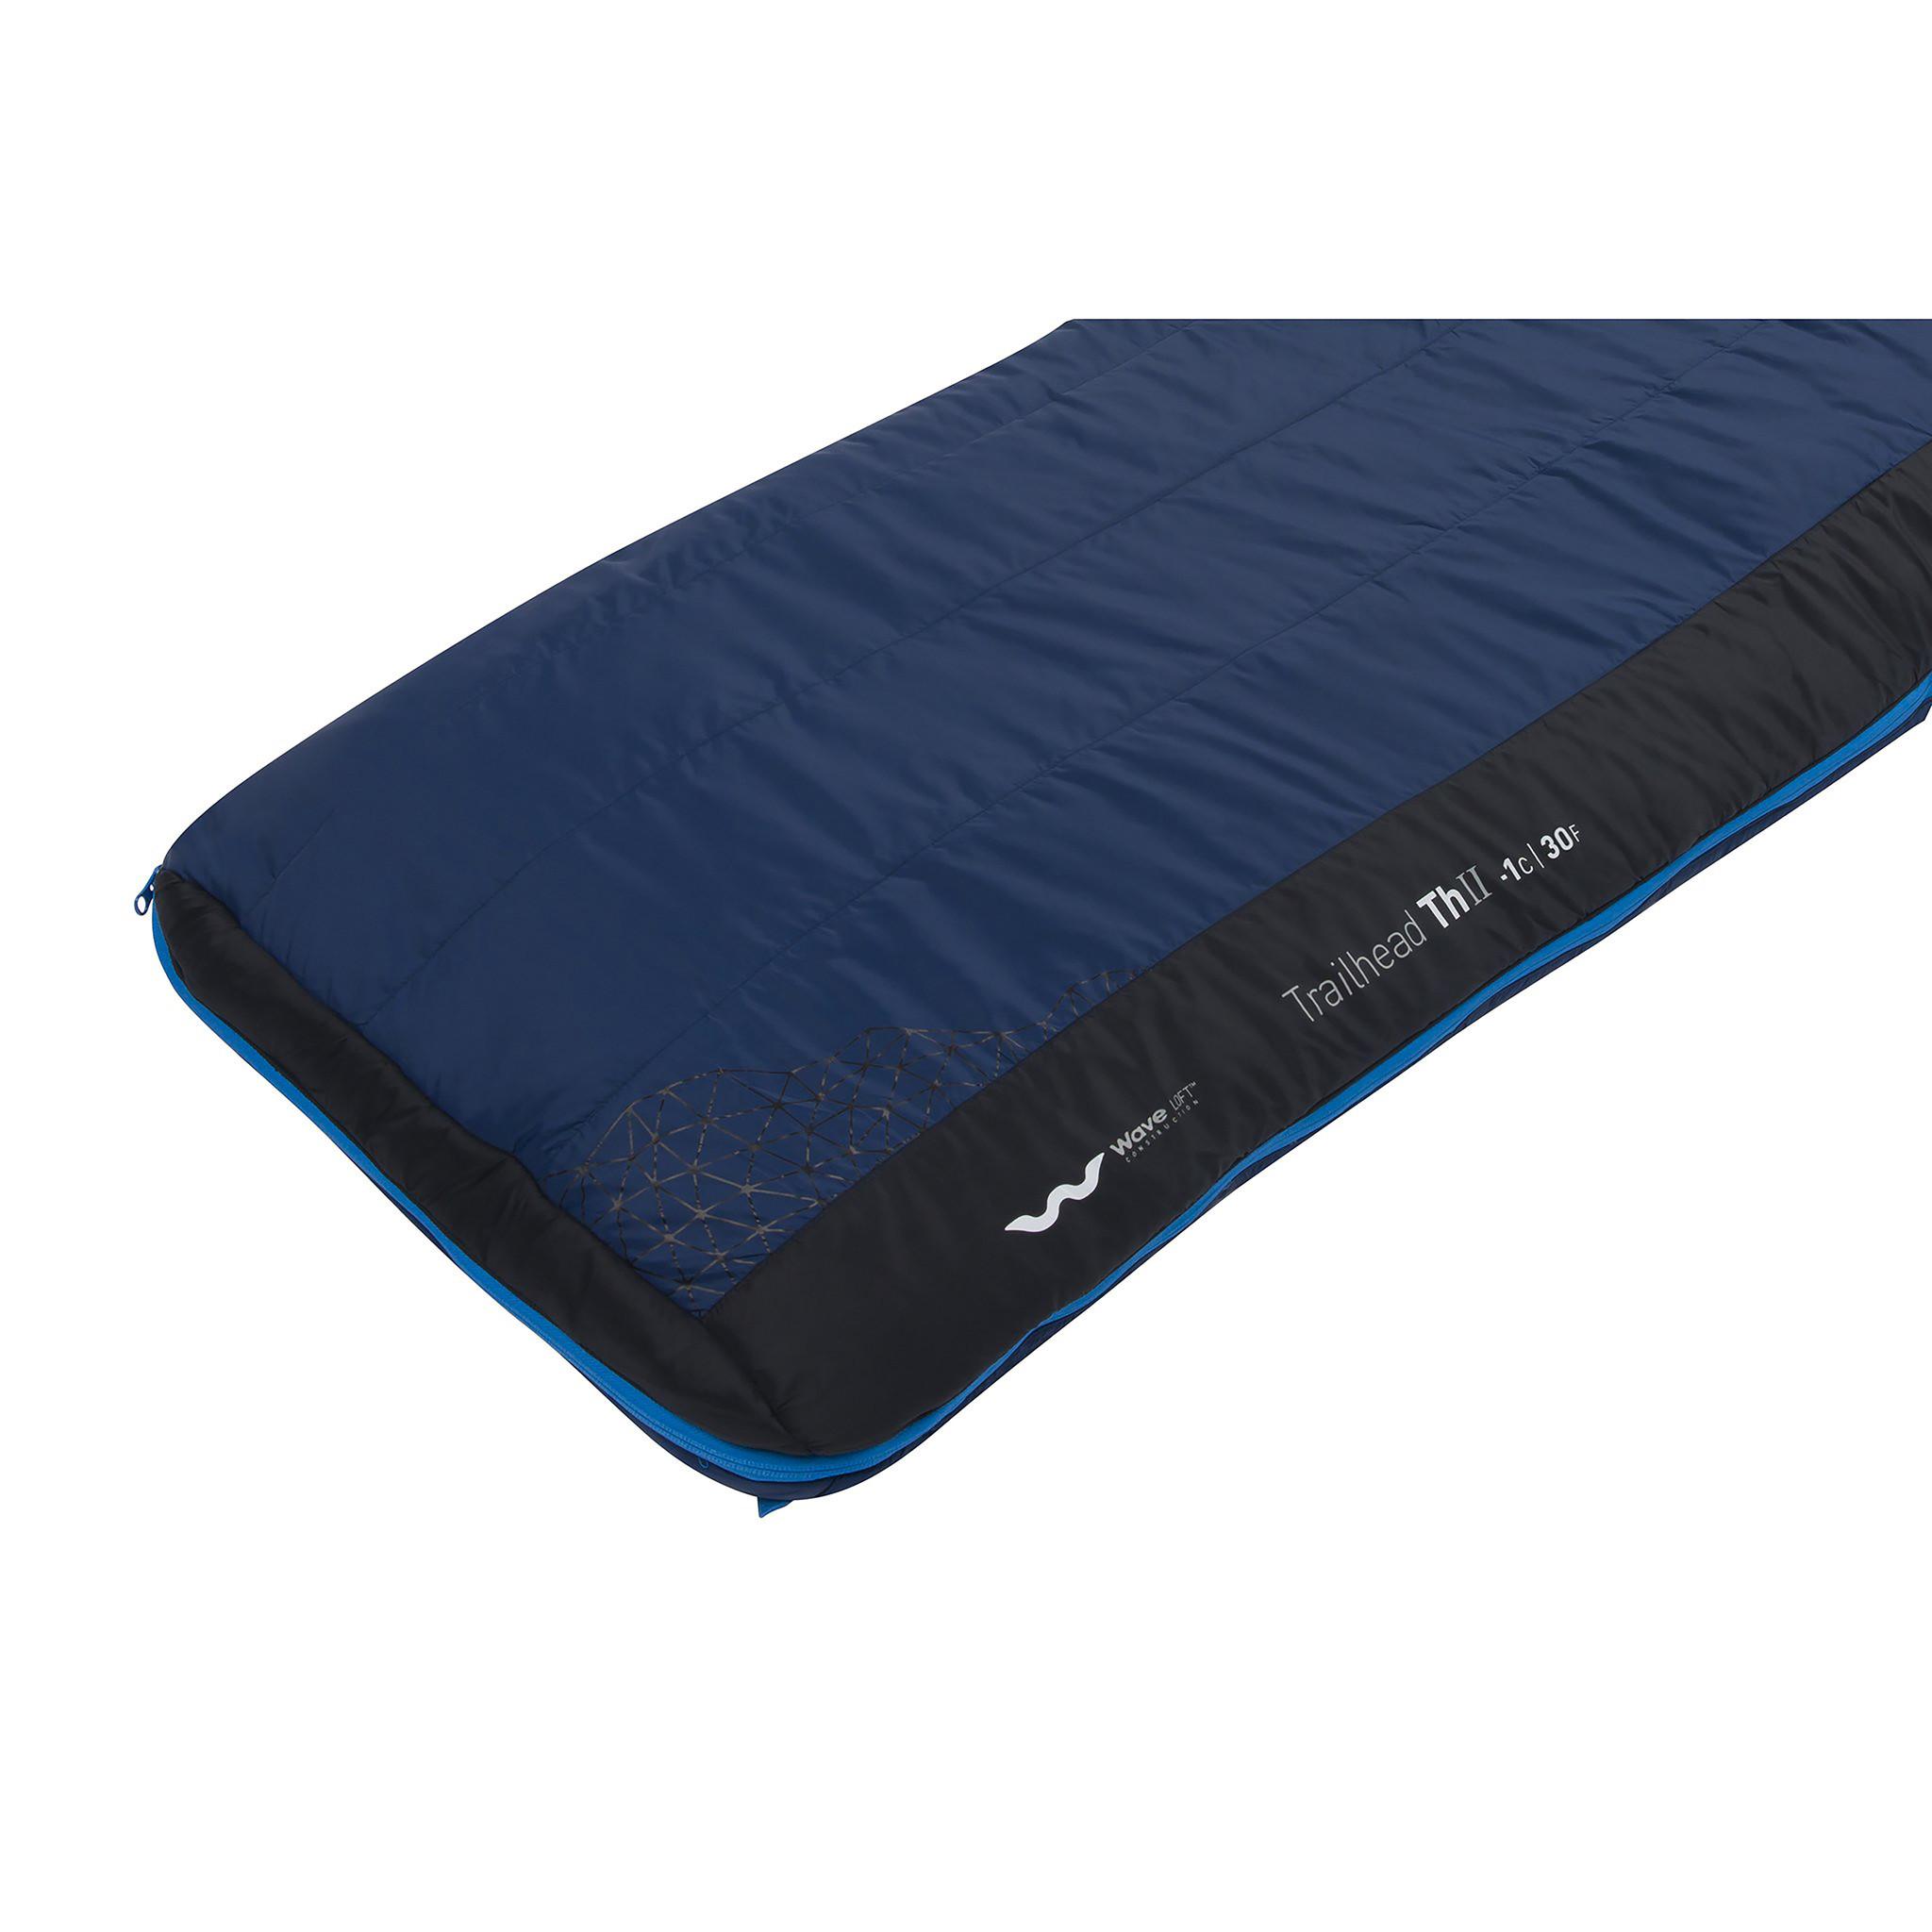 Trailhead Synthetic Sleeping Bag, 30F, Long-4